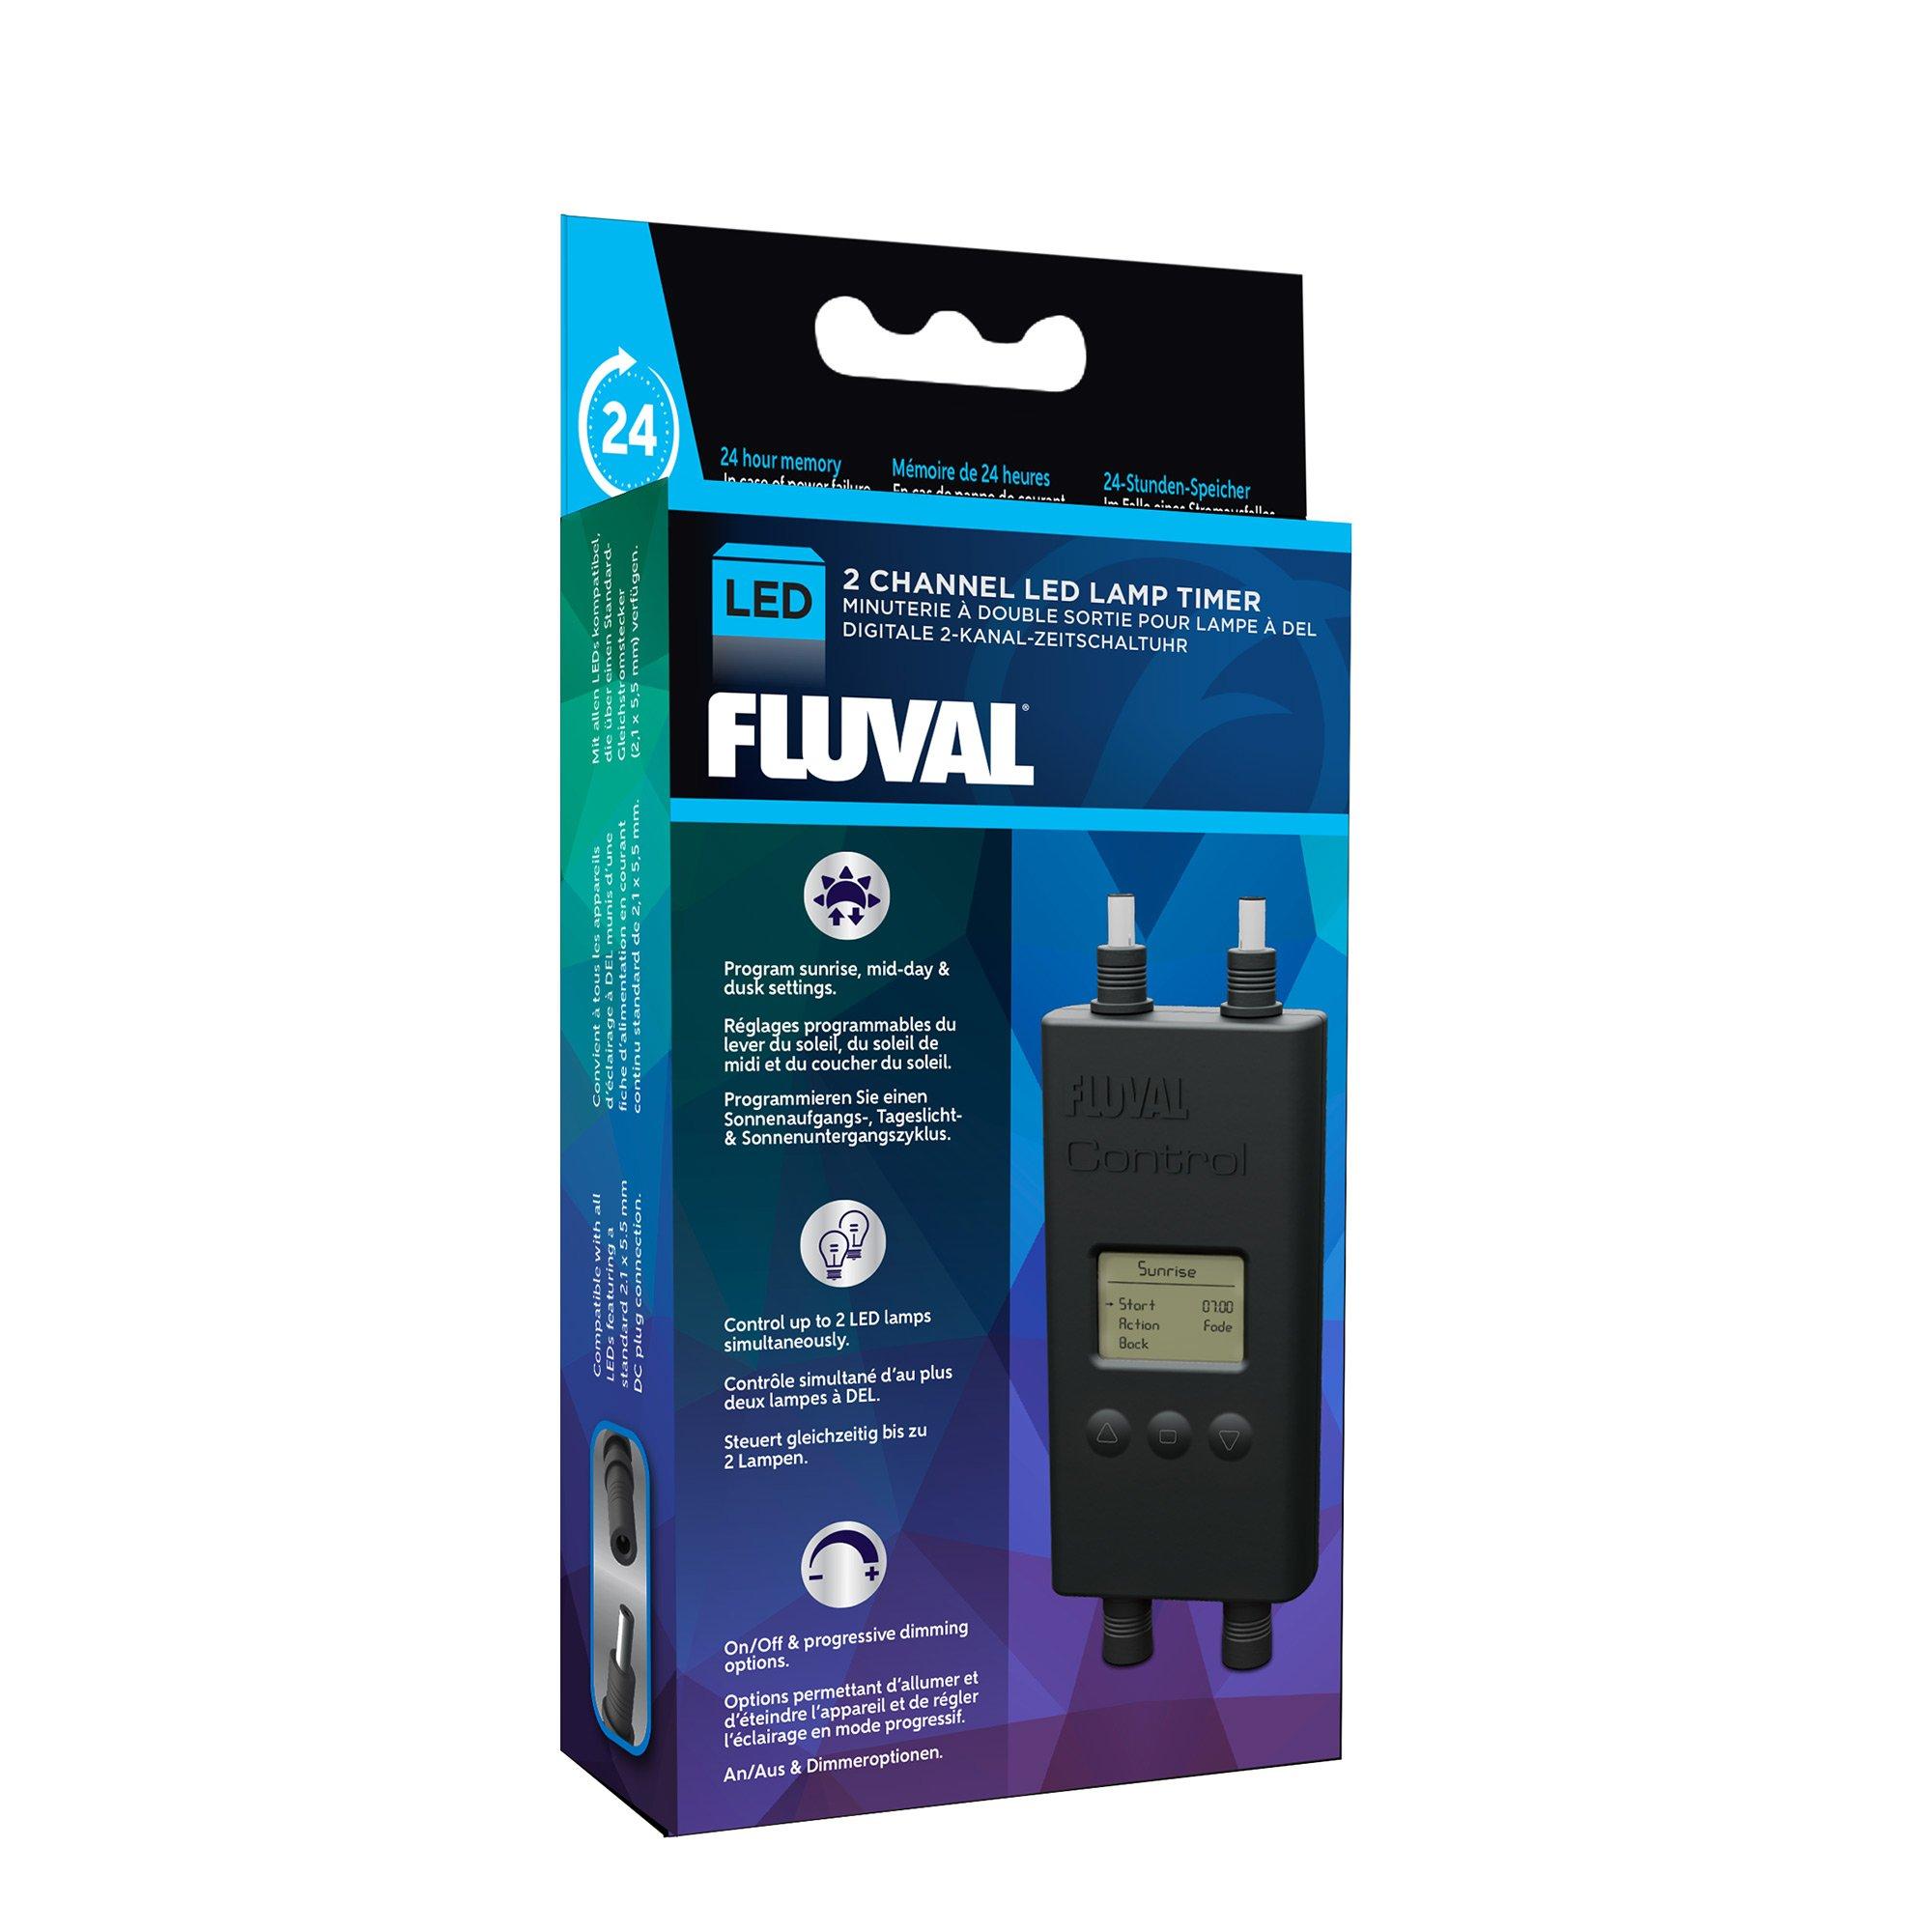 Fluval 2 Channel LED Lamp Timer